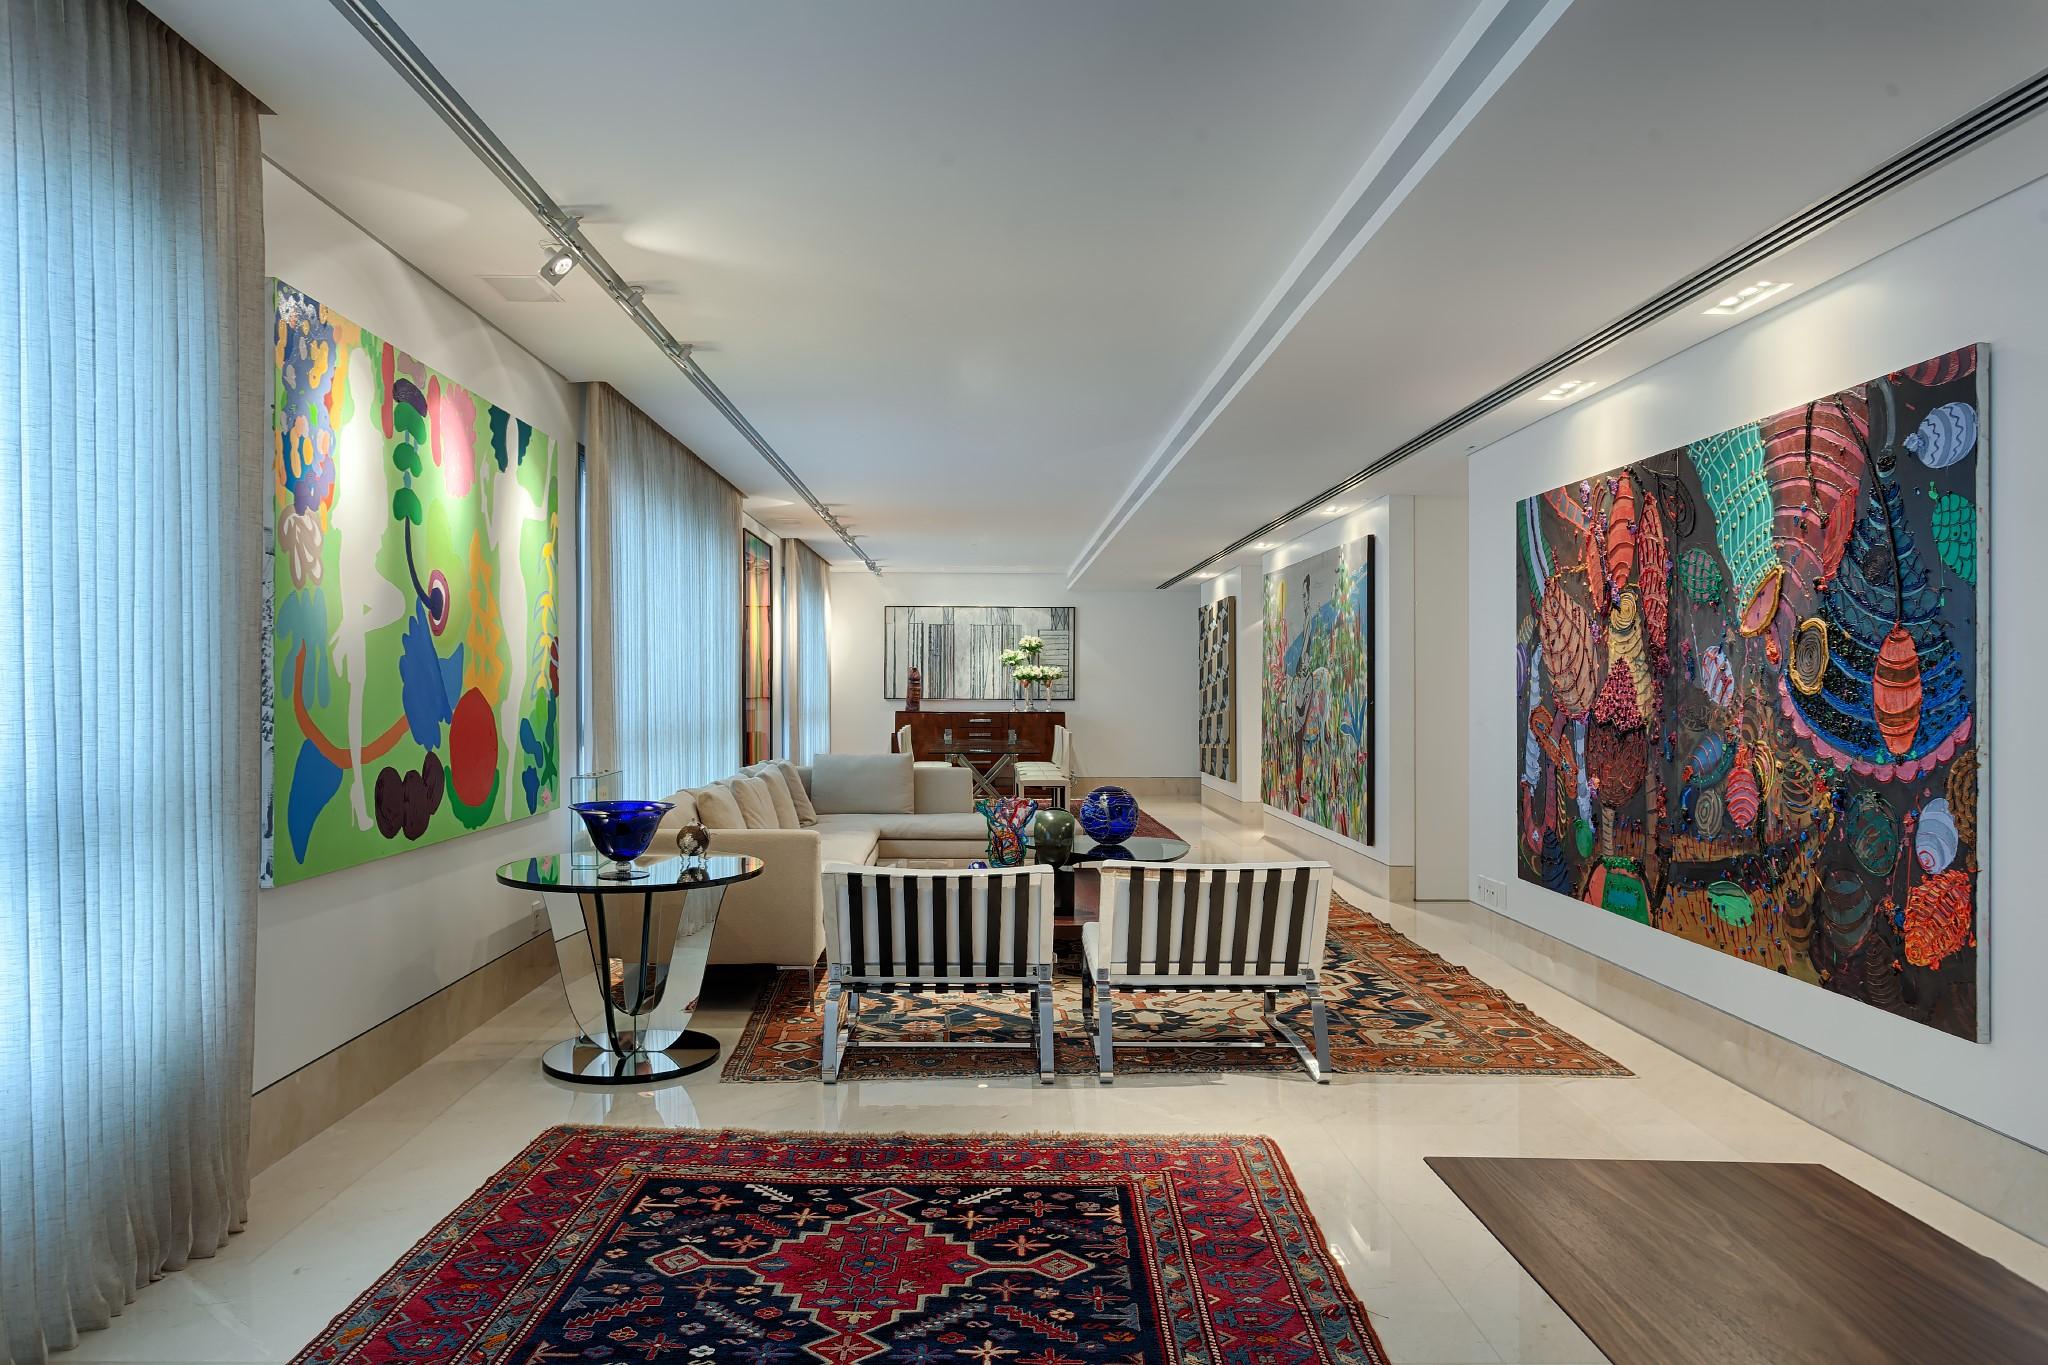 apartamento-lourdes-hg-arquitetura-fernando-hermanny-germana-giannetti-gustavo-xavier-arquitetos-belo-horizonte-projetos-decoracao-1